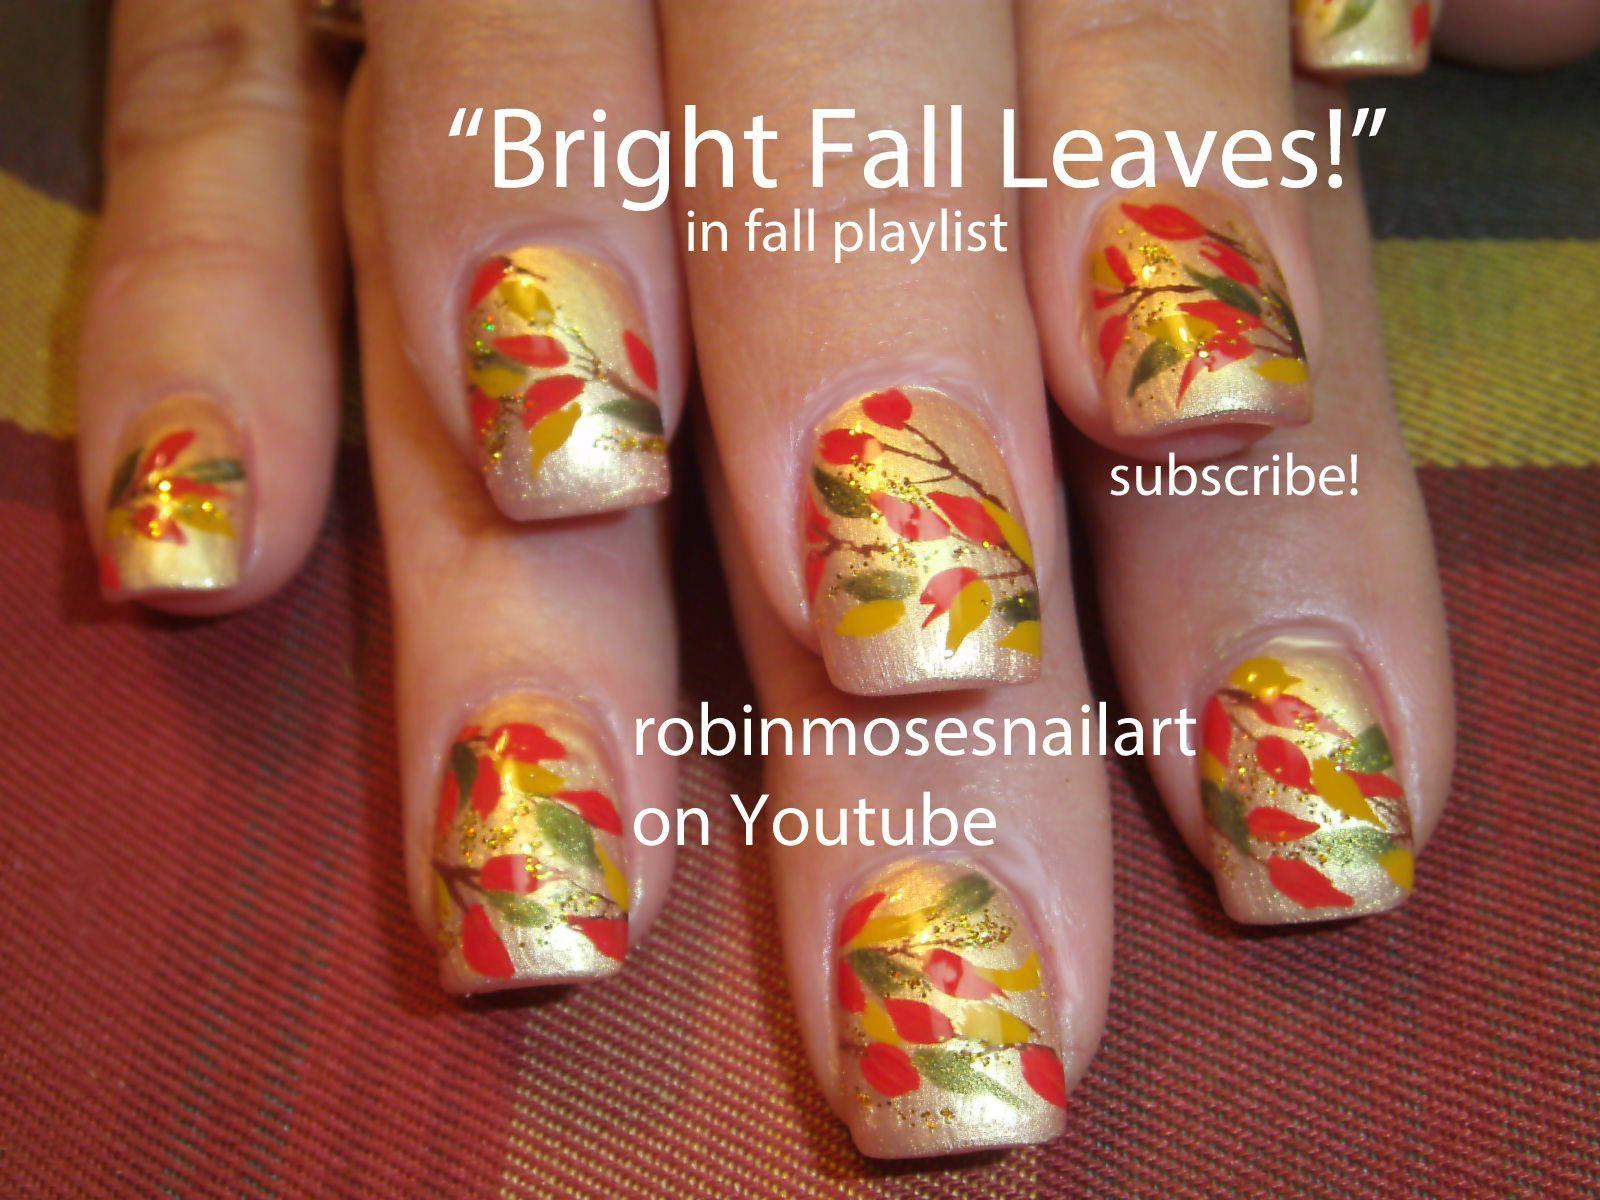 Einfaches haustürdesign nail art designs bilder einfach bilder designs einfach  nail art